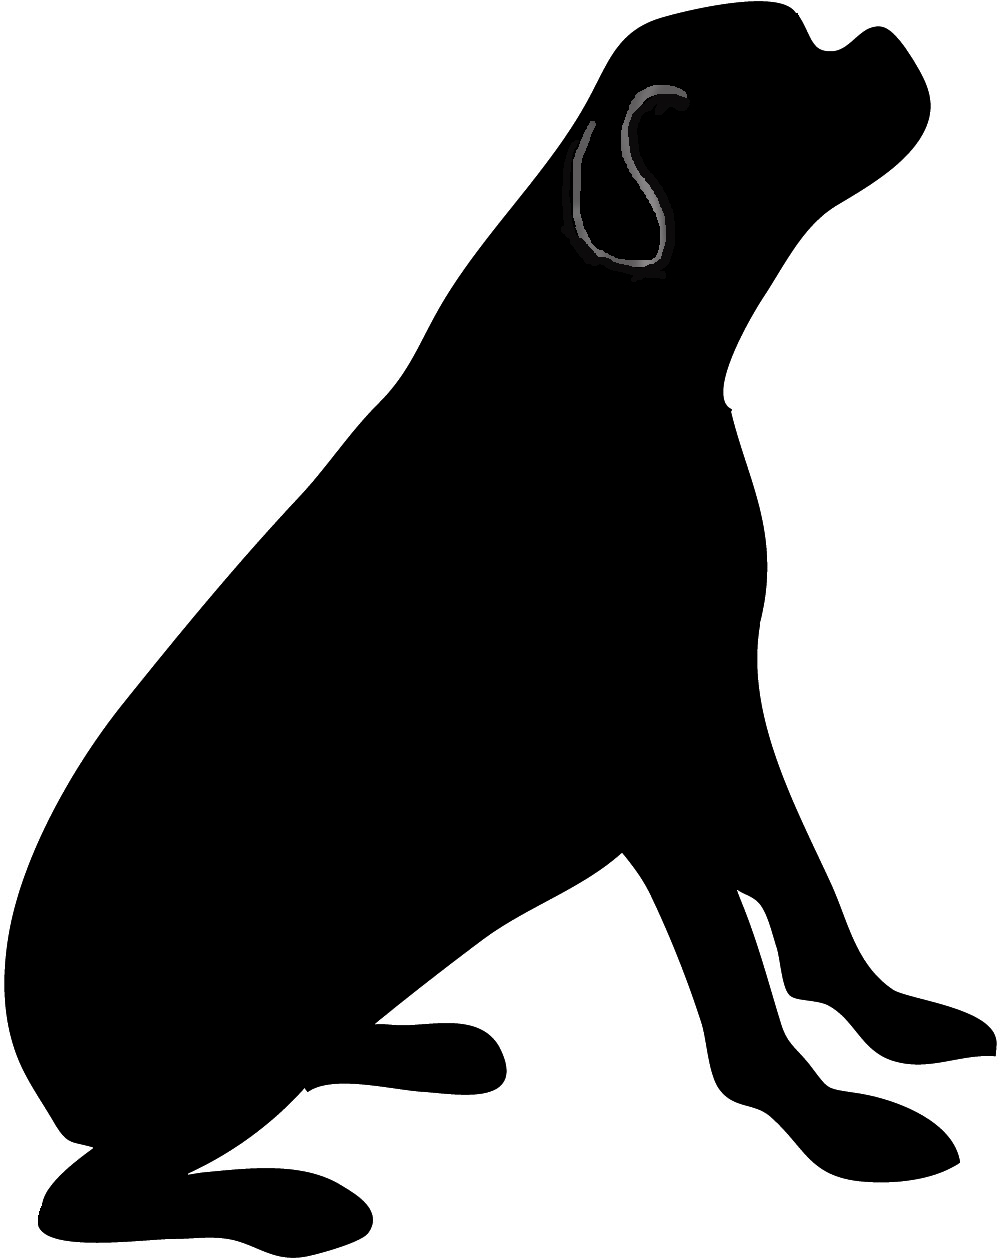 dog silhouette black white